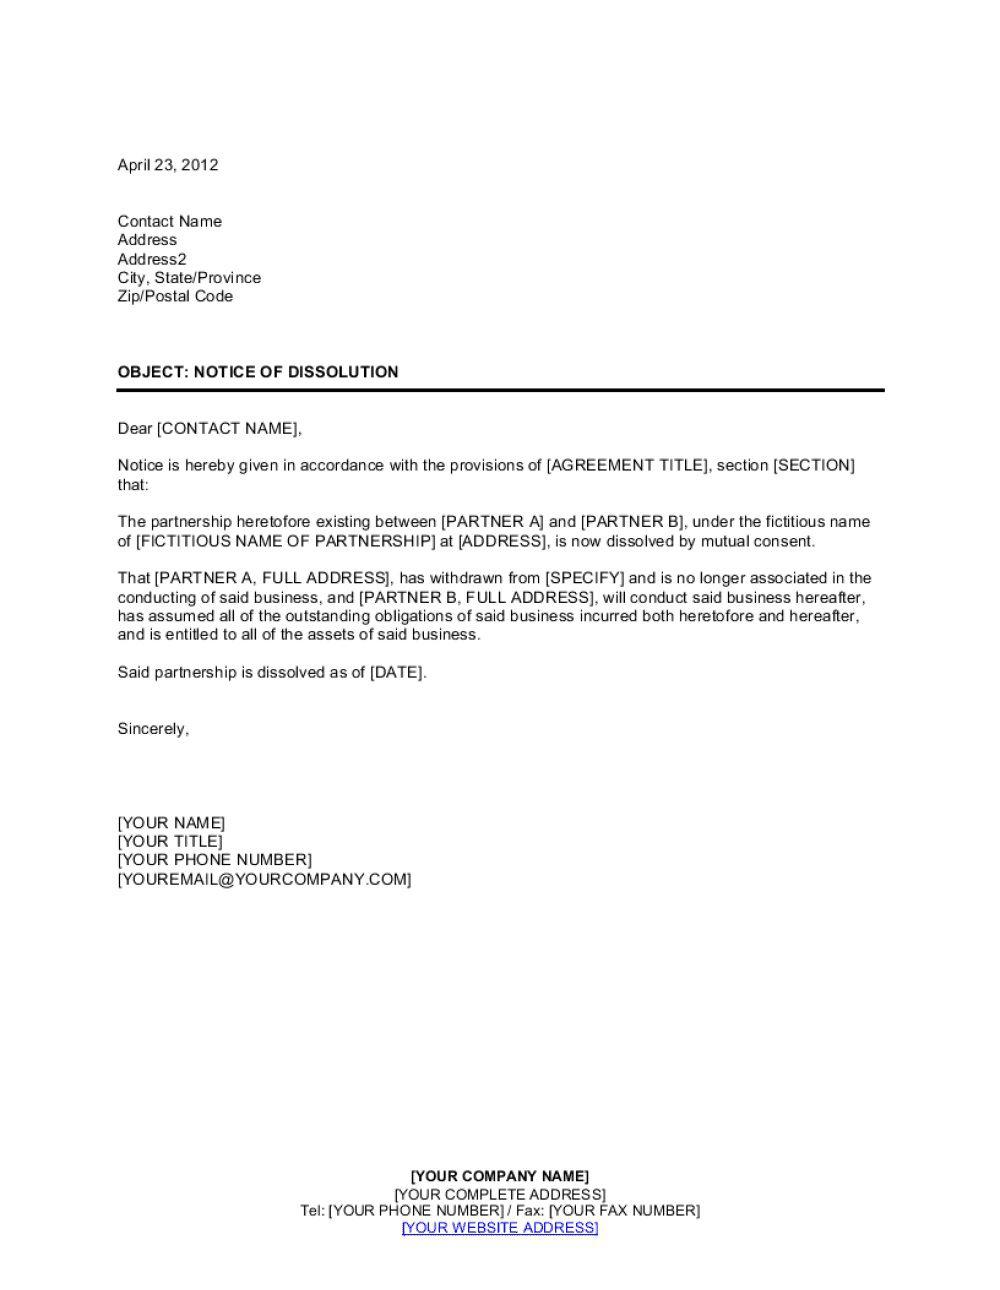 003 Top Busines Partnership Separation Agreement Template Photo  Partner TerminationFull